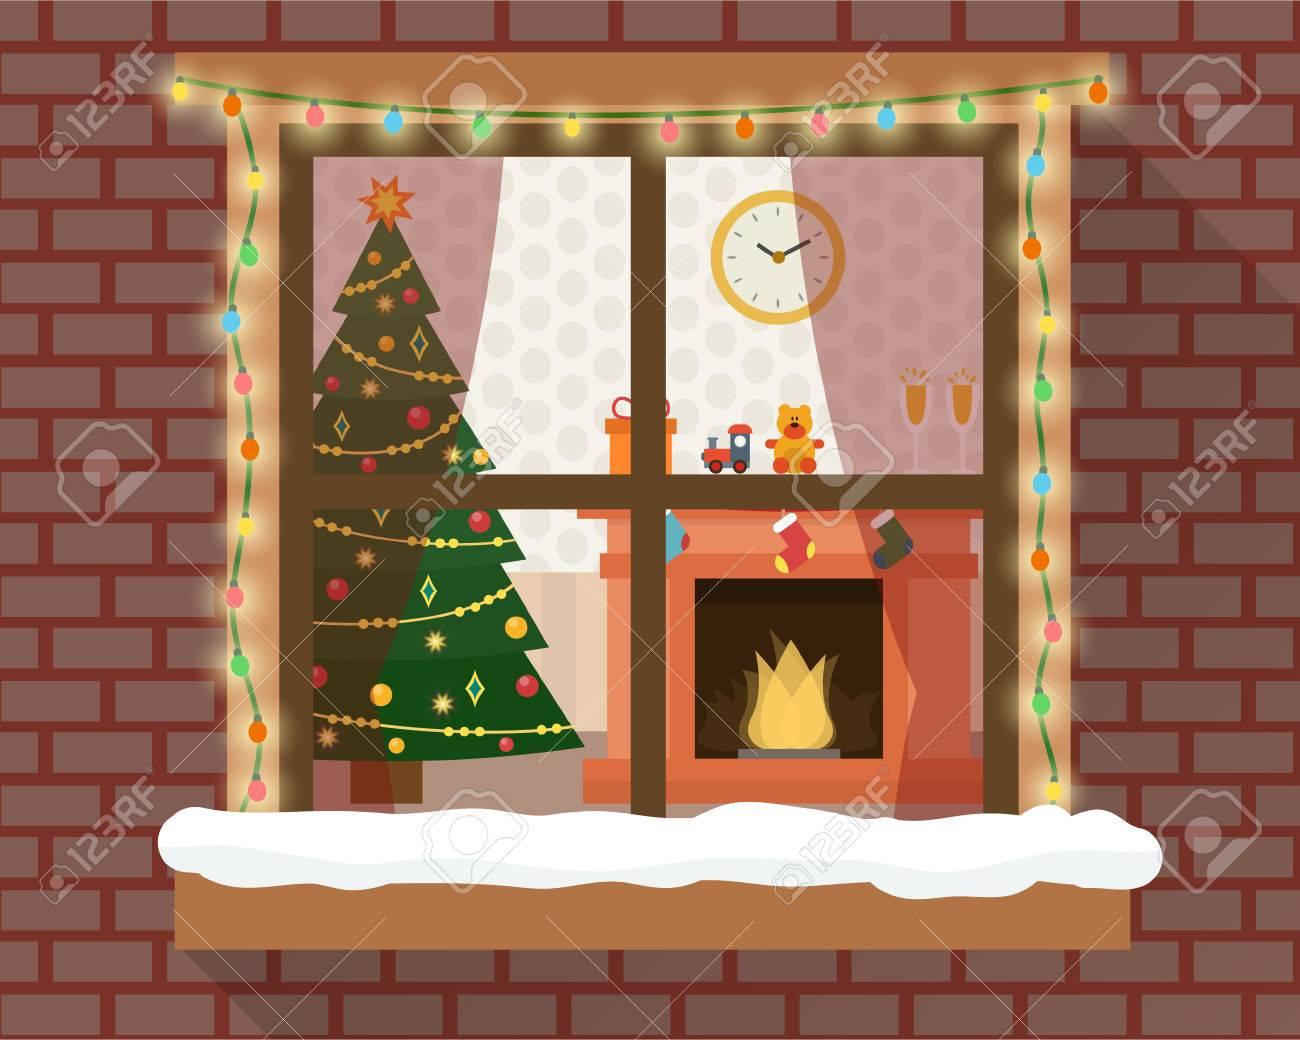 christmas room with furniture christmas tree and fireplace